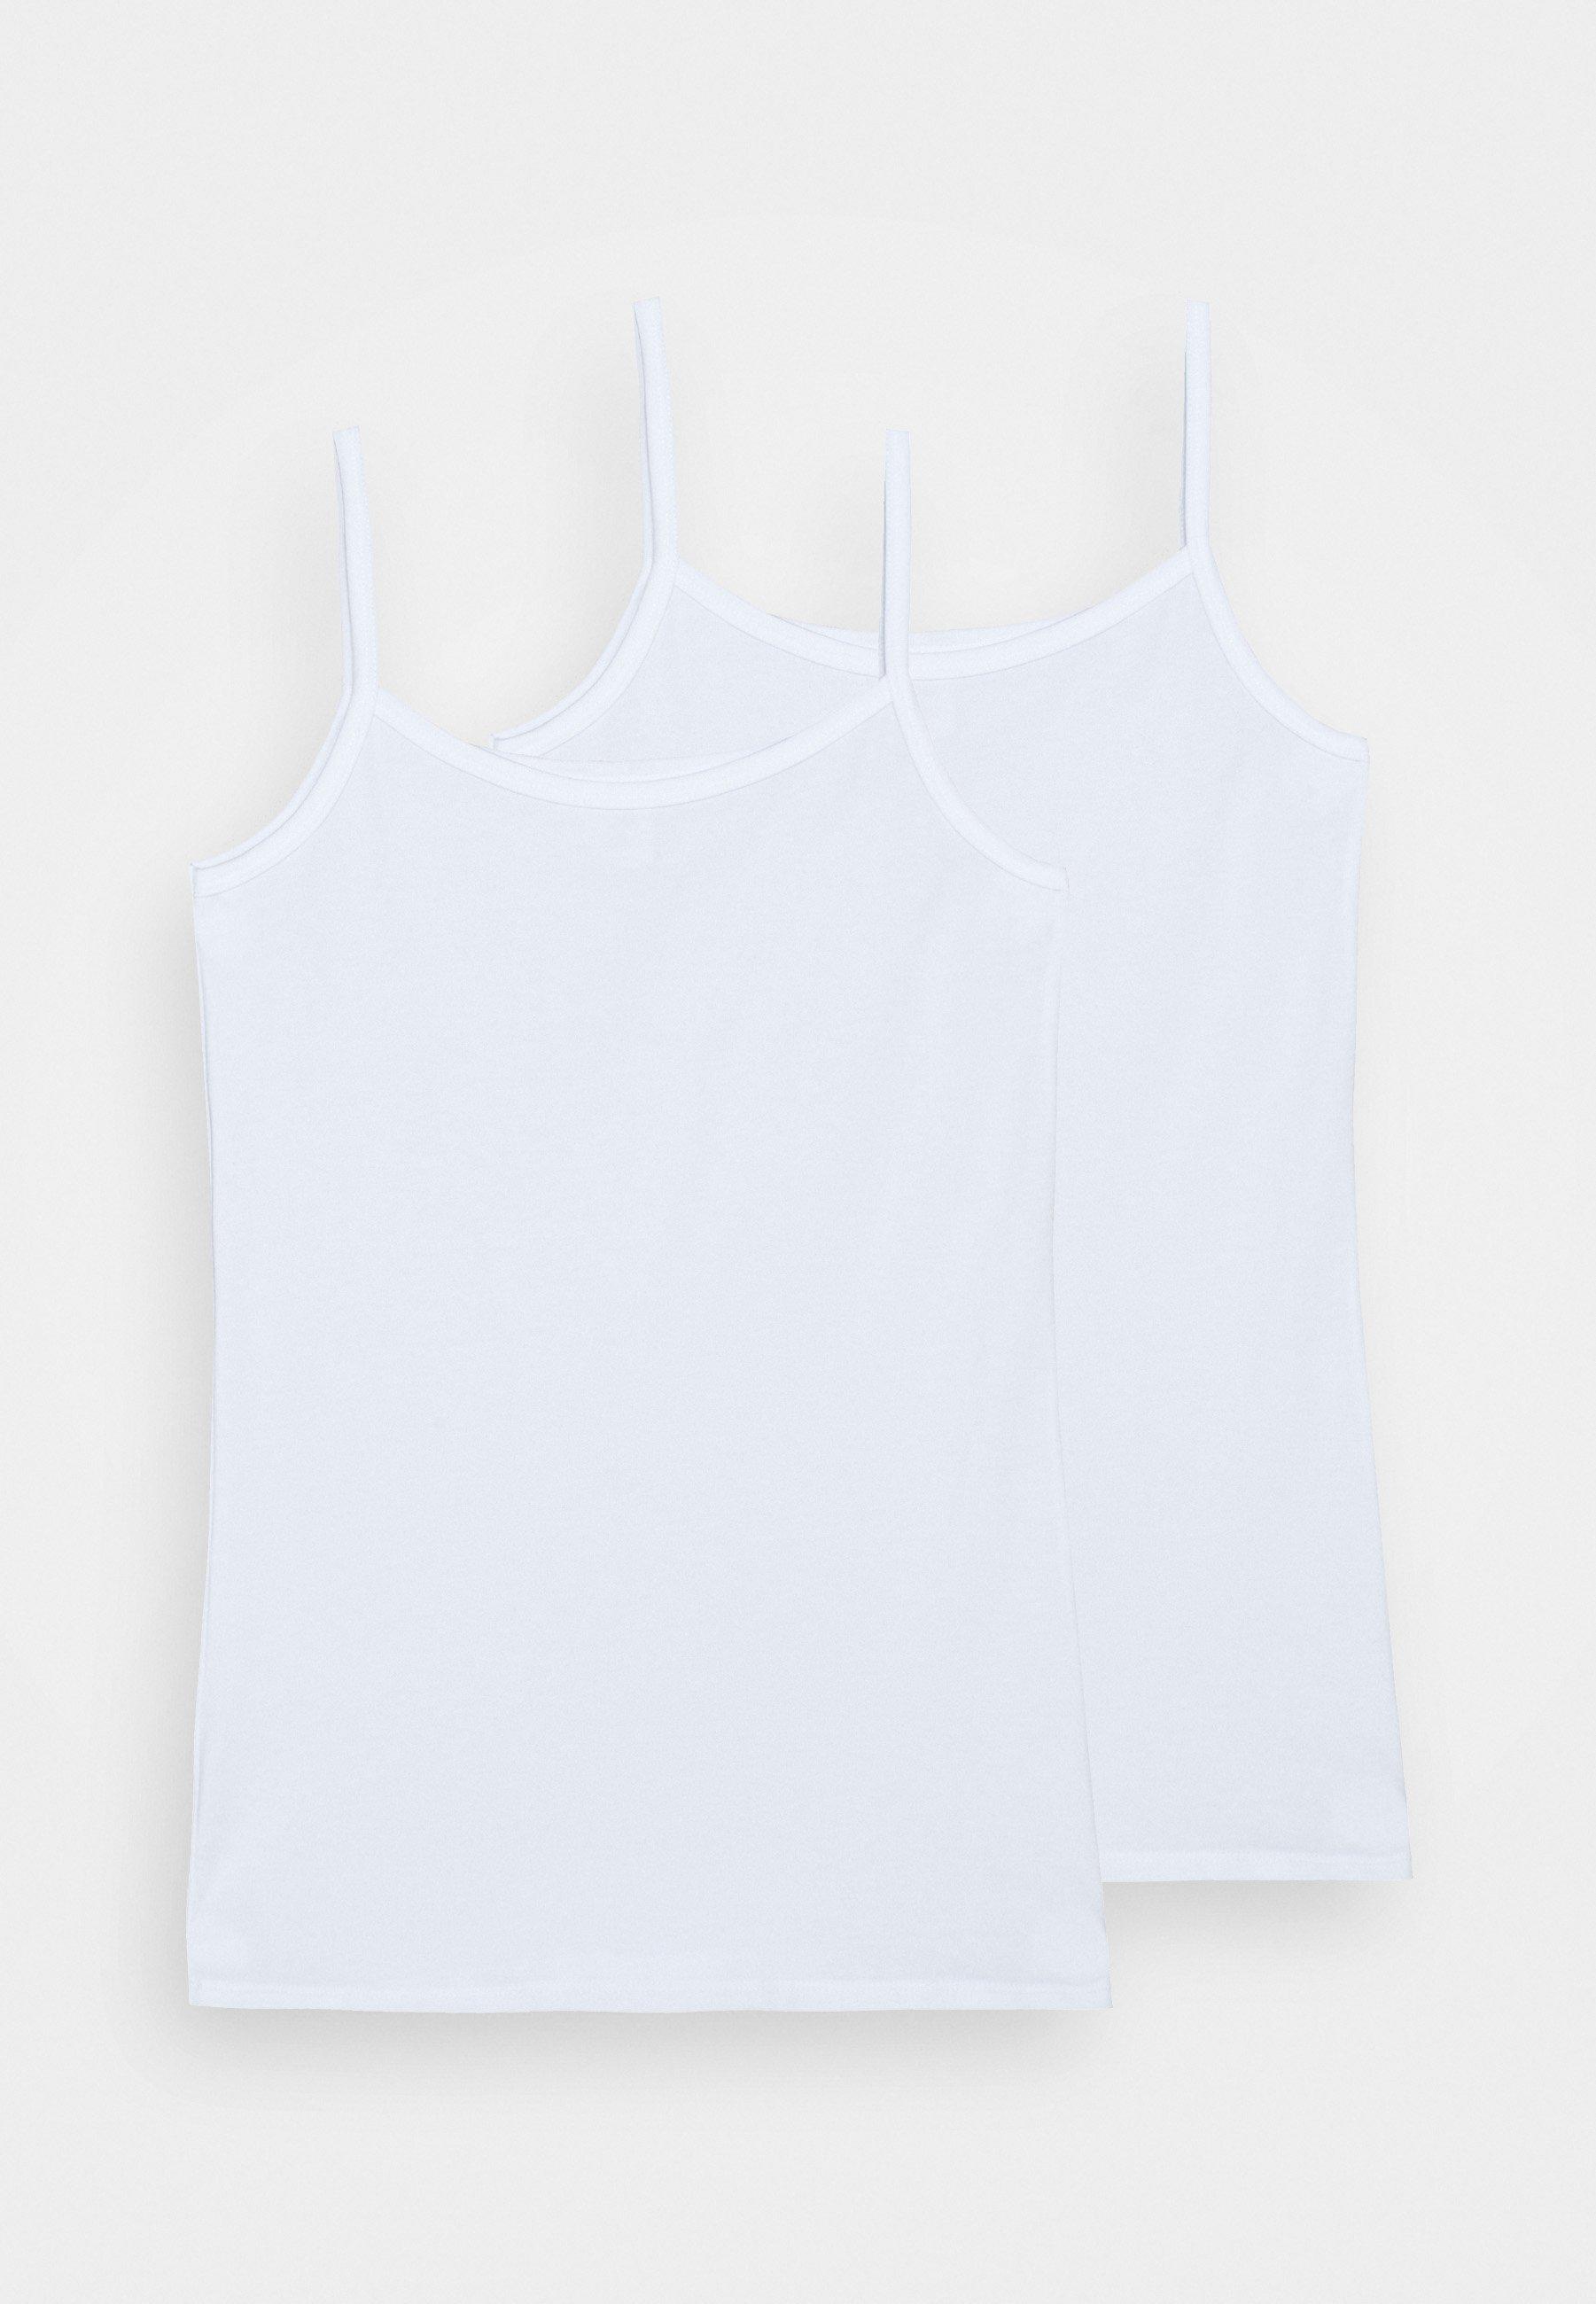 Kids TEENS SPAGHETTI TOPS 95/5 2 PACK - Undershirt